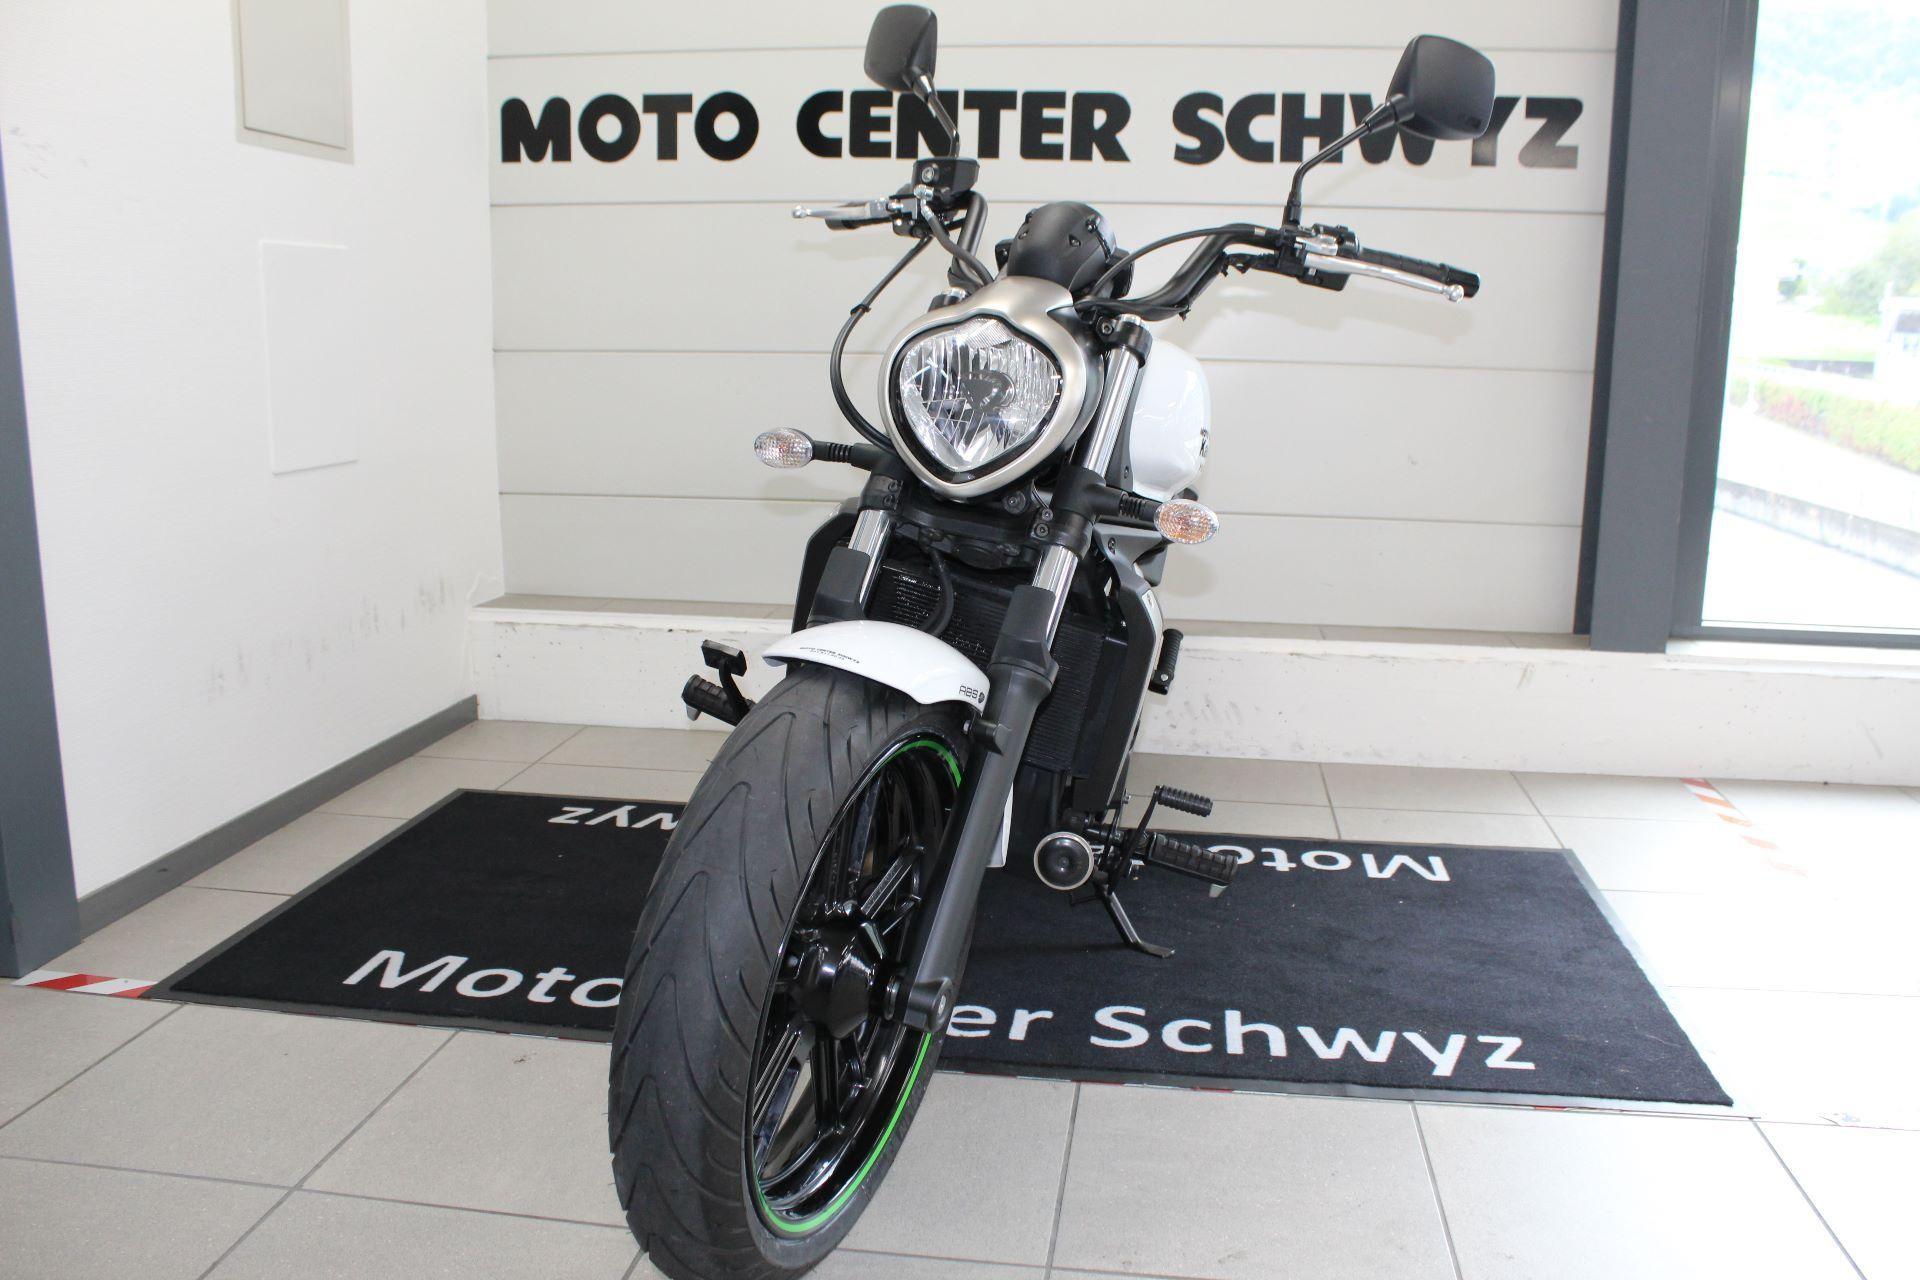 moto occasions acheter kawasaki vulcan s 650 moto center schwyz ag seewen schwyz. Black Bedroom Furniture Sets. Home Design Ideas